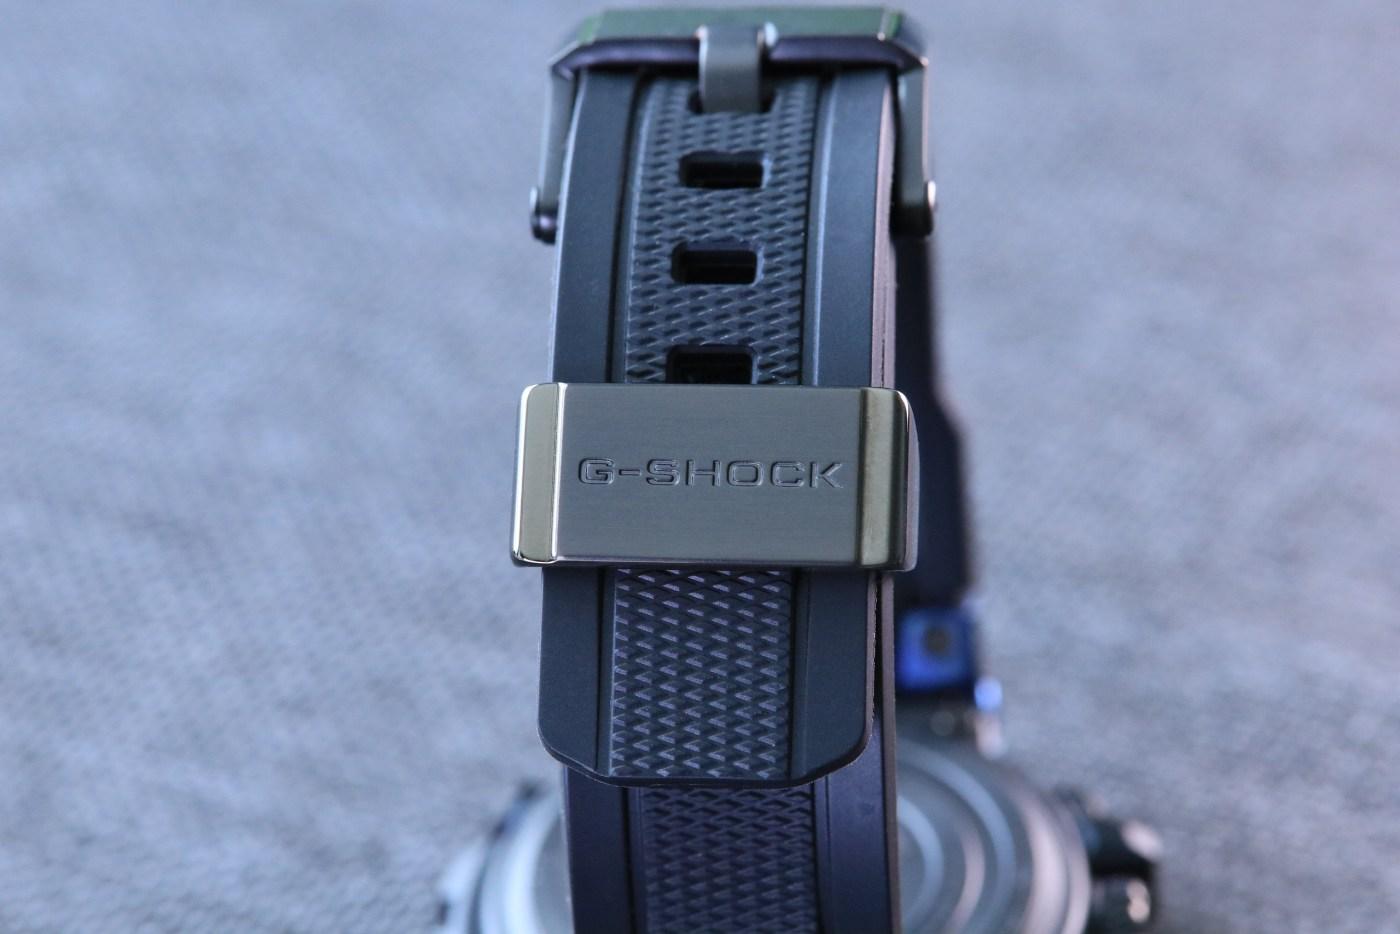 G-Shock MT-G Carbon Fiber MTGB1000XB-1A strap detail